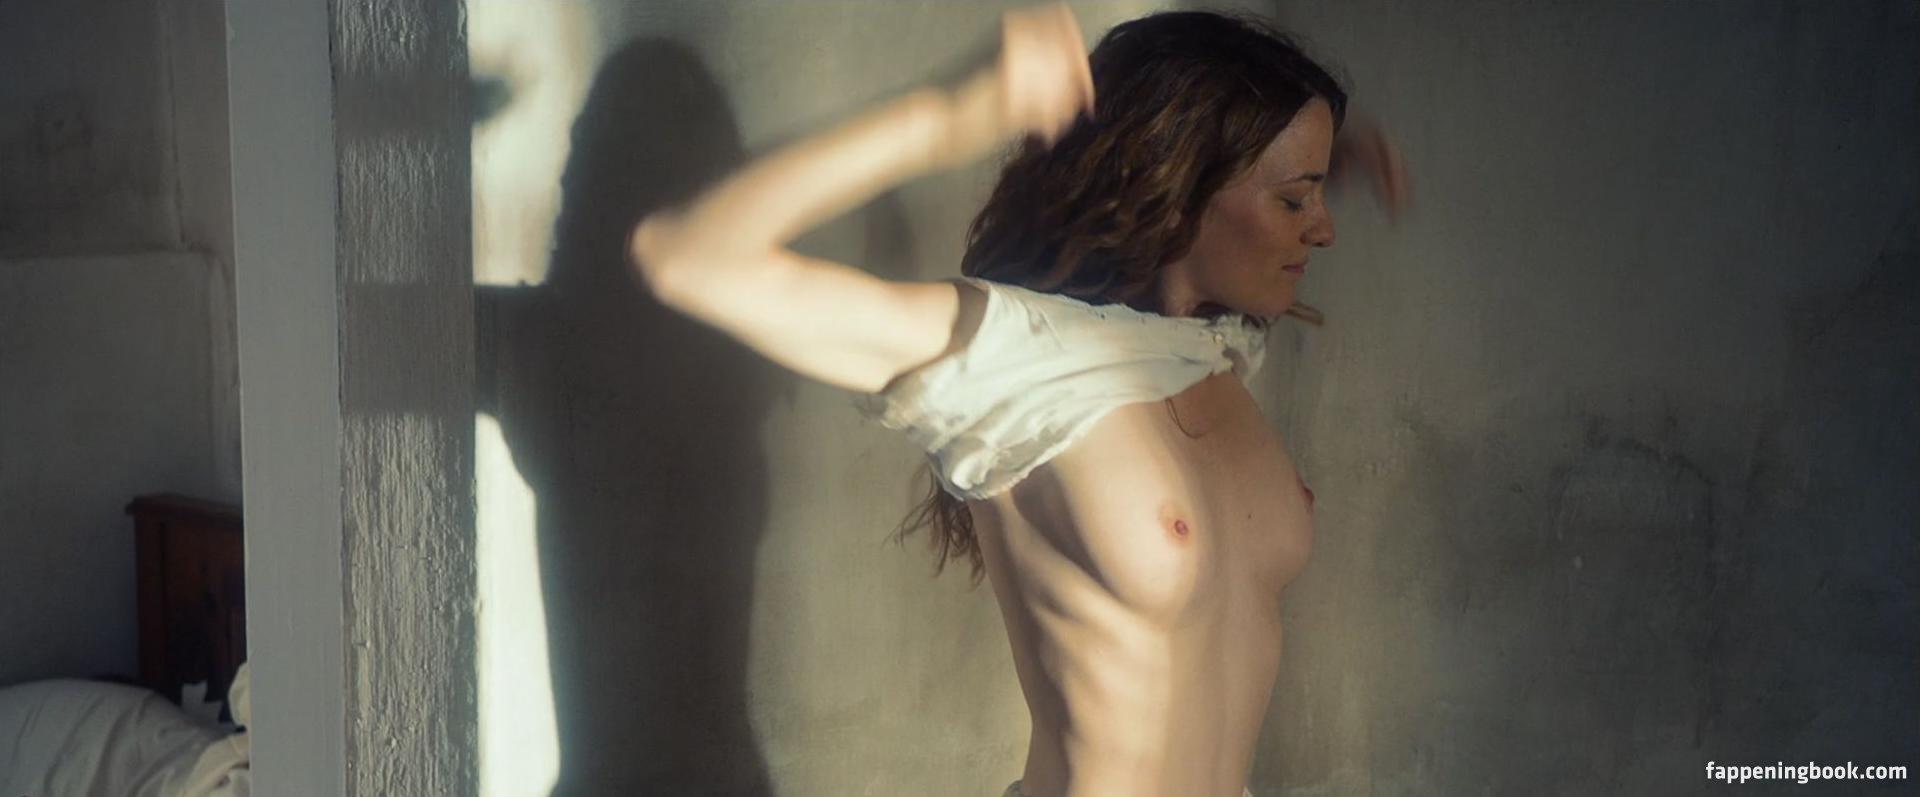 Johannesson  nackt Mona 49 hot